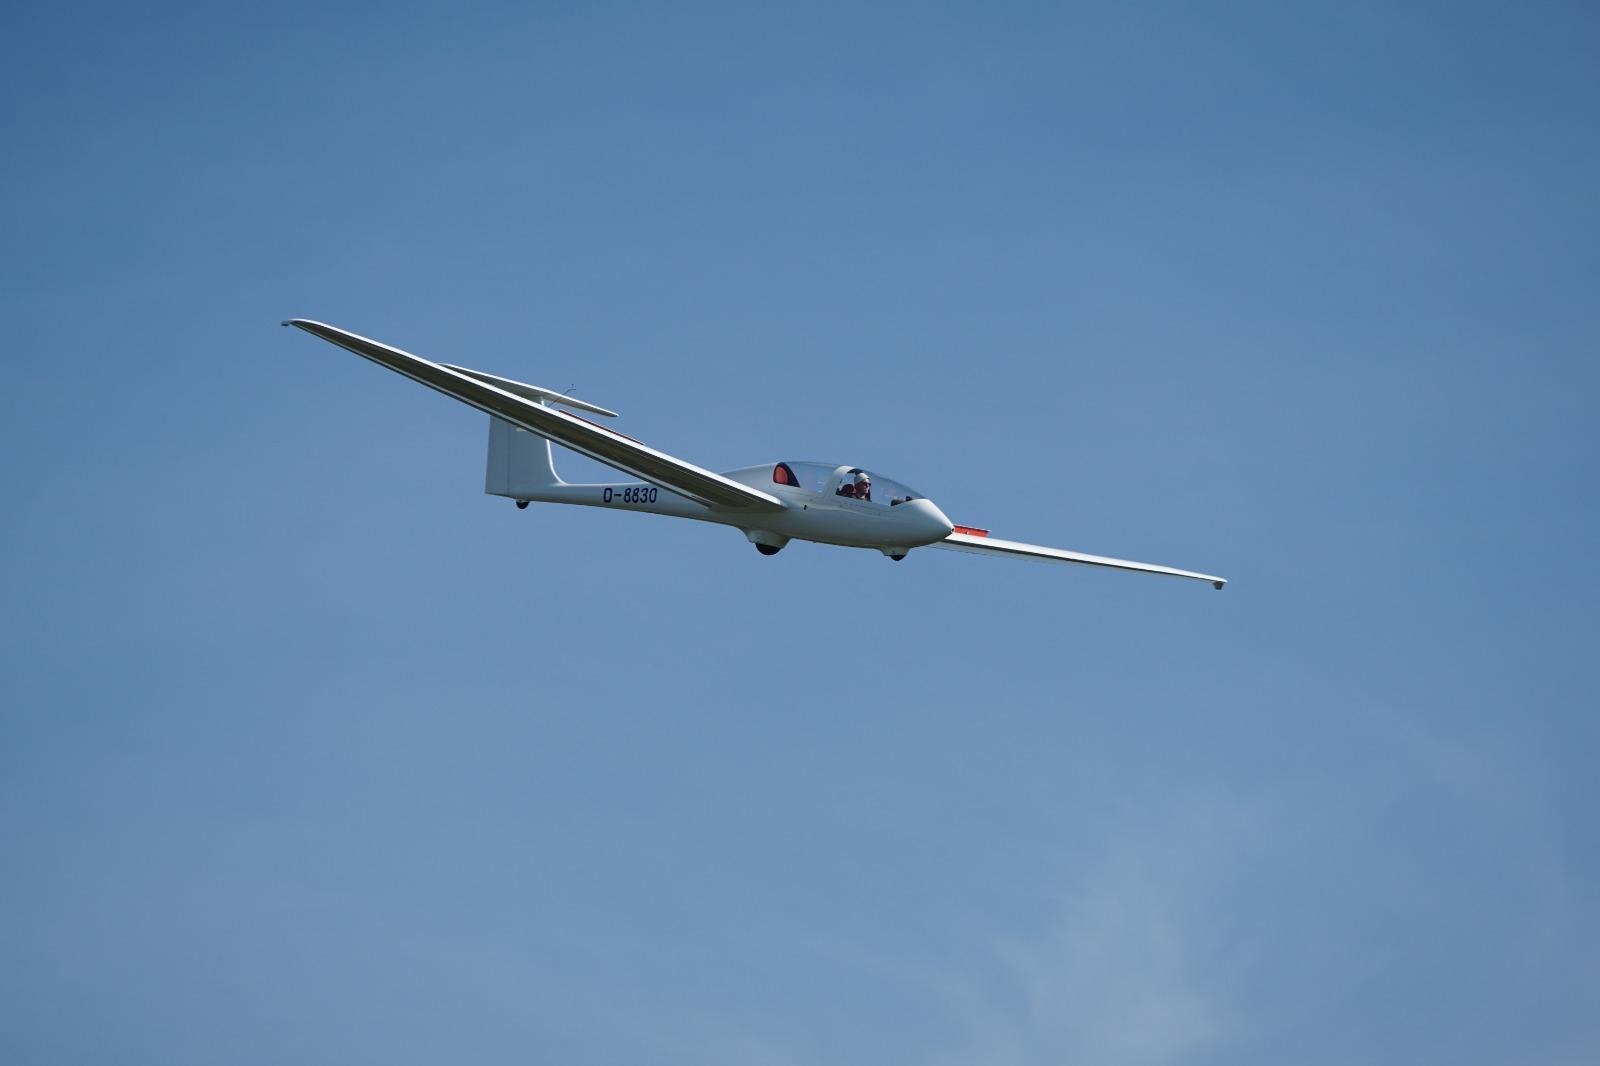 D-8830 Anflug